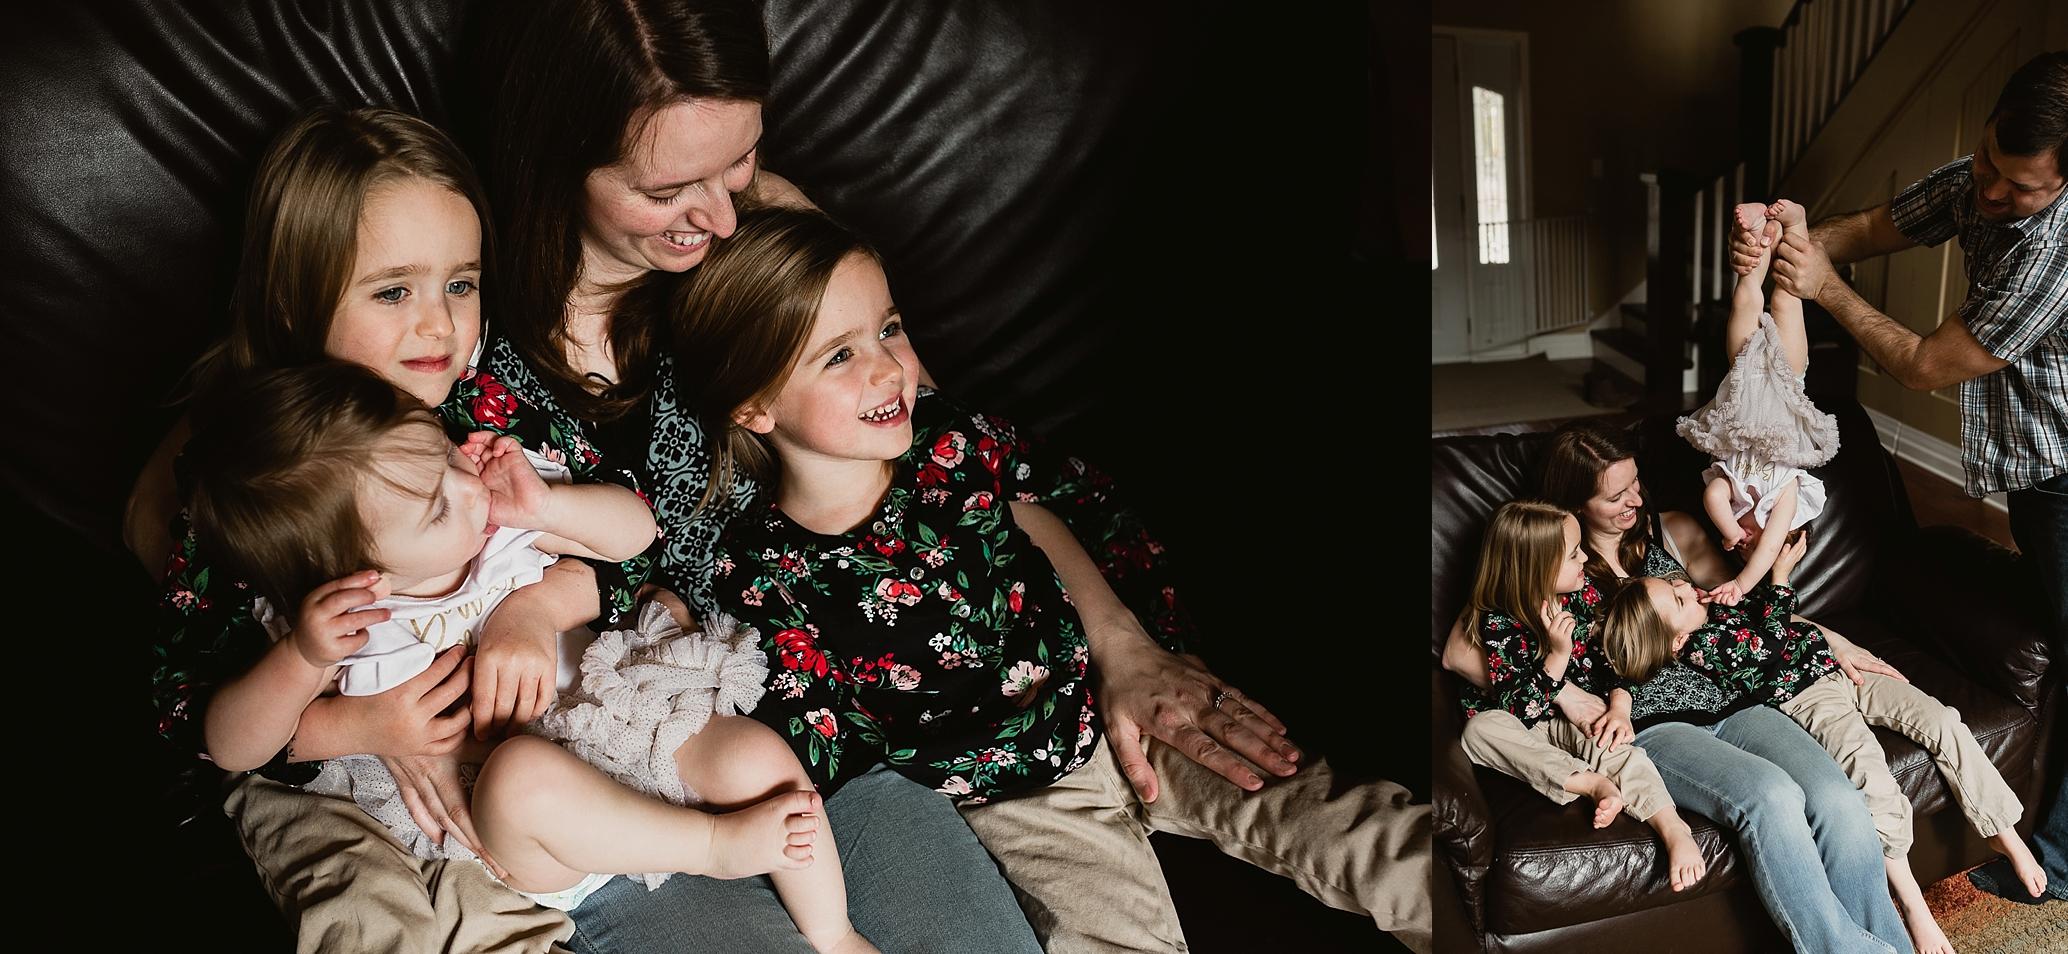 Alina+Joy+Photography+Cold+Lake+Family+Photographer-30.jpg